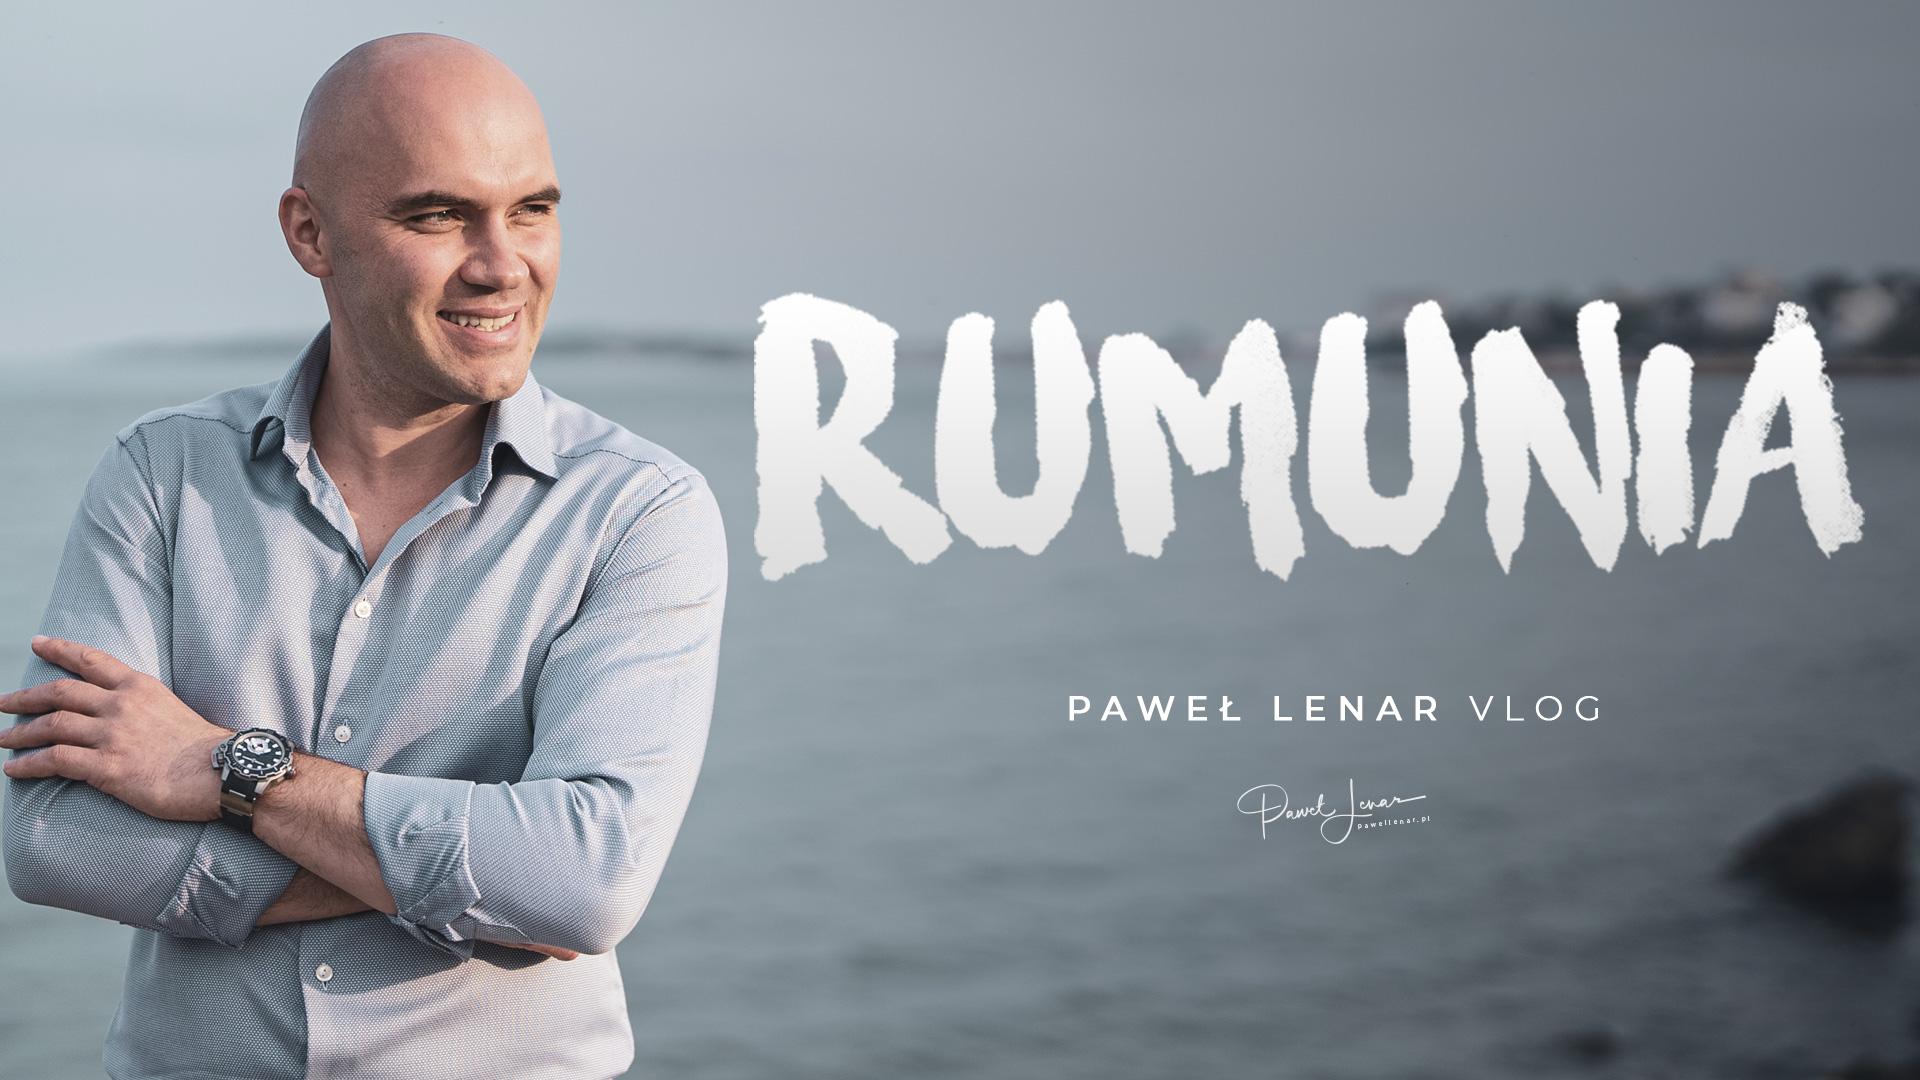 rumunia vlog - Paweł Lenar Blog